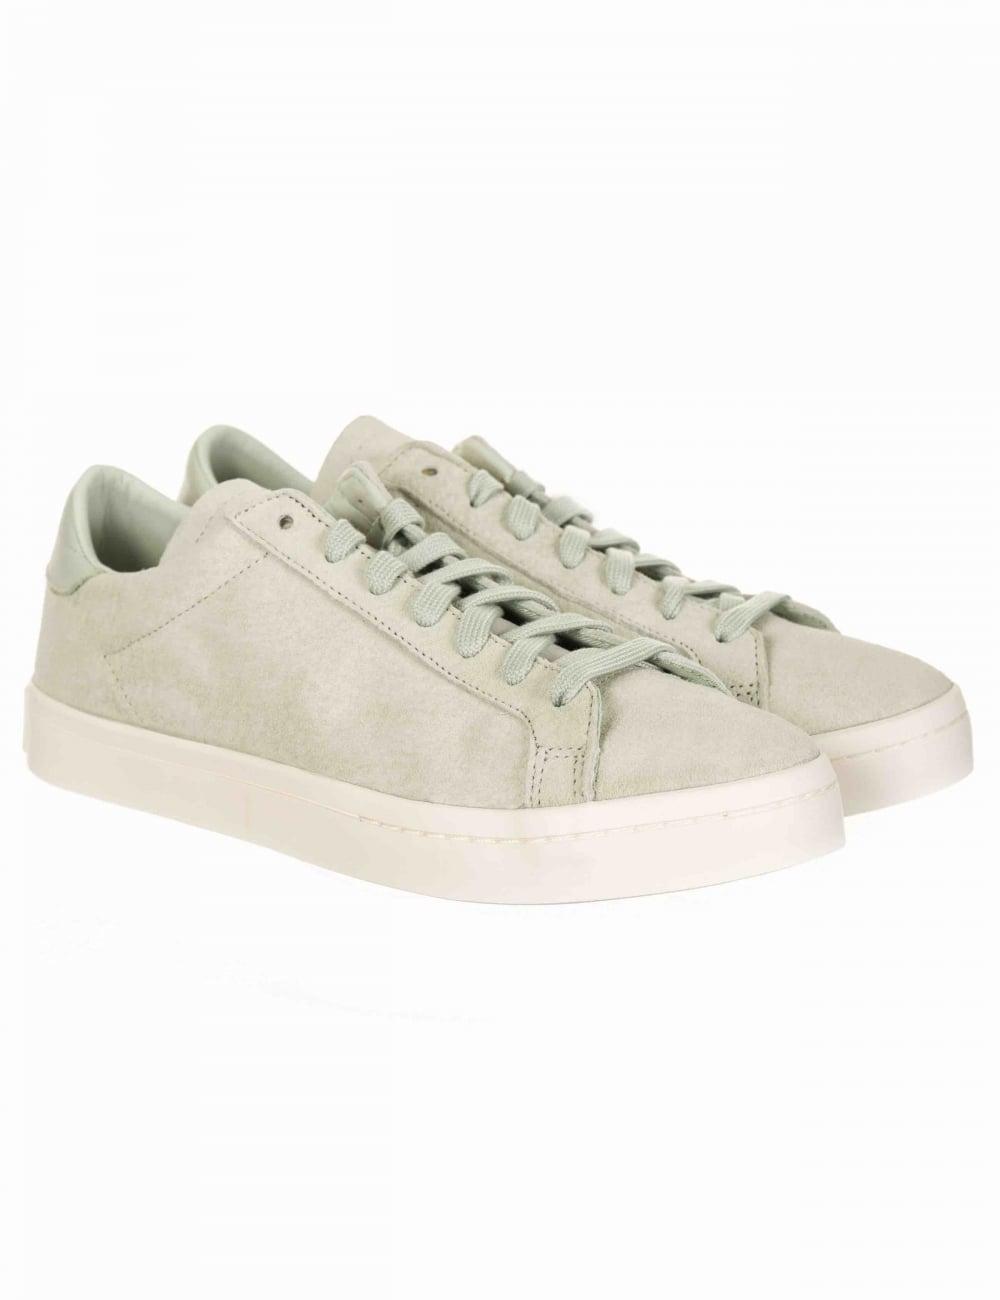 low priced 16275 6169c Court Vantage Shoes - Linen GreenLinen Green